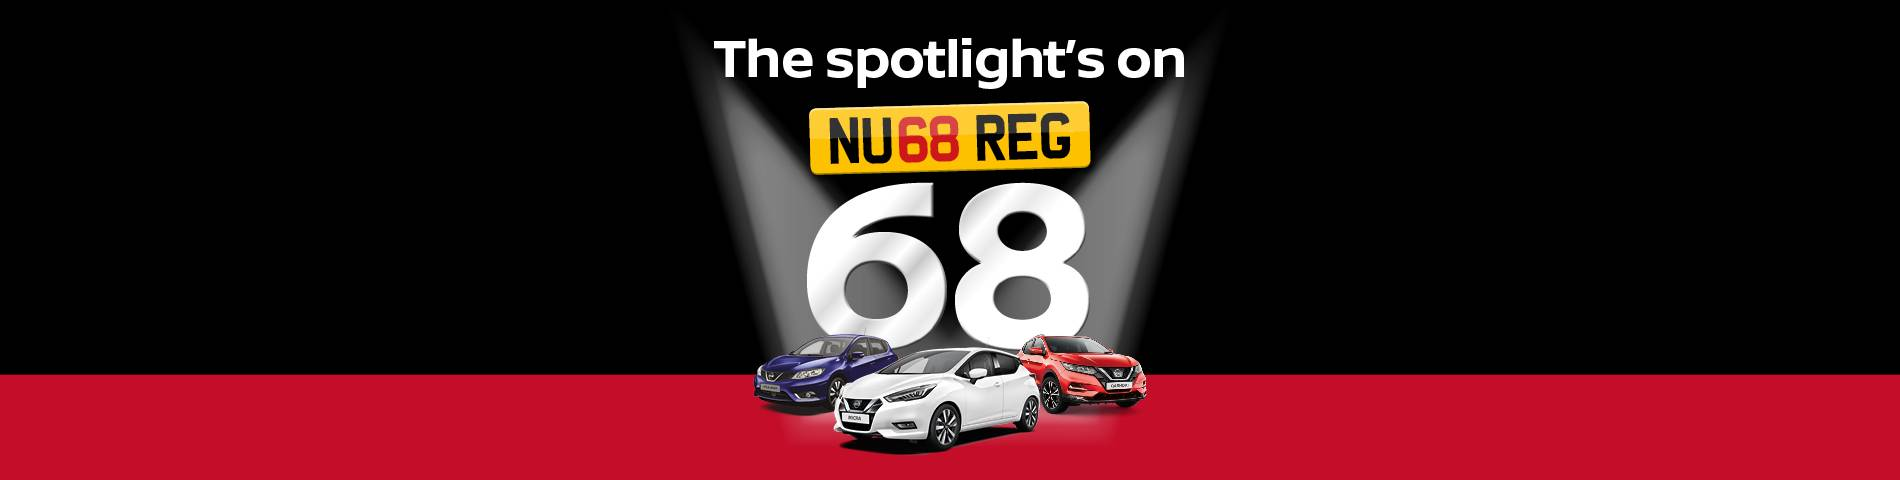 Nissan VIP 68 Reg